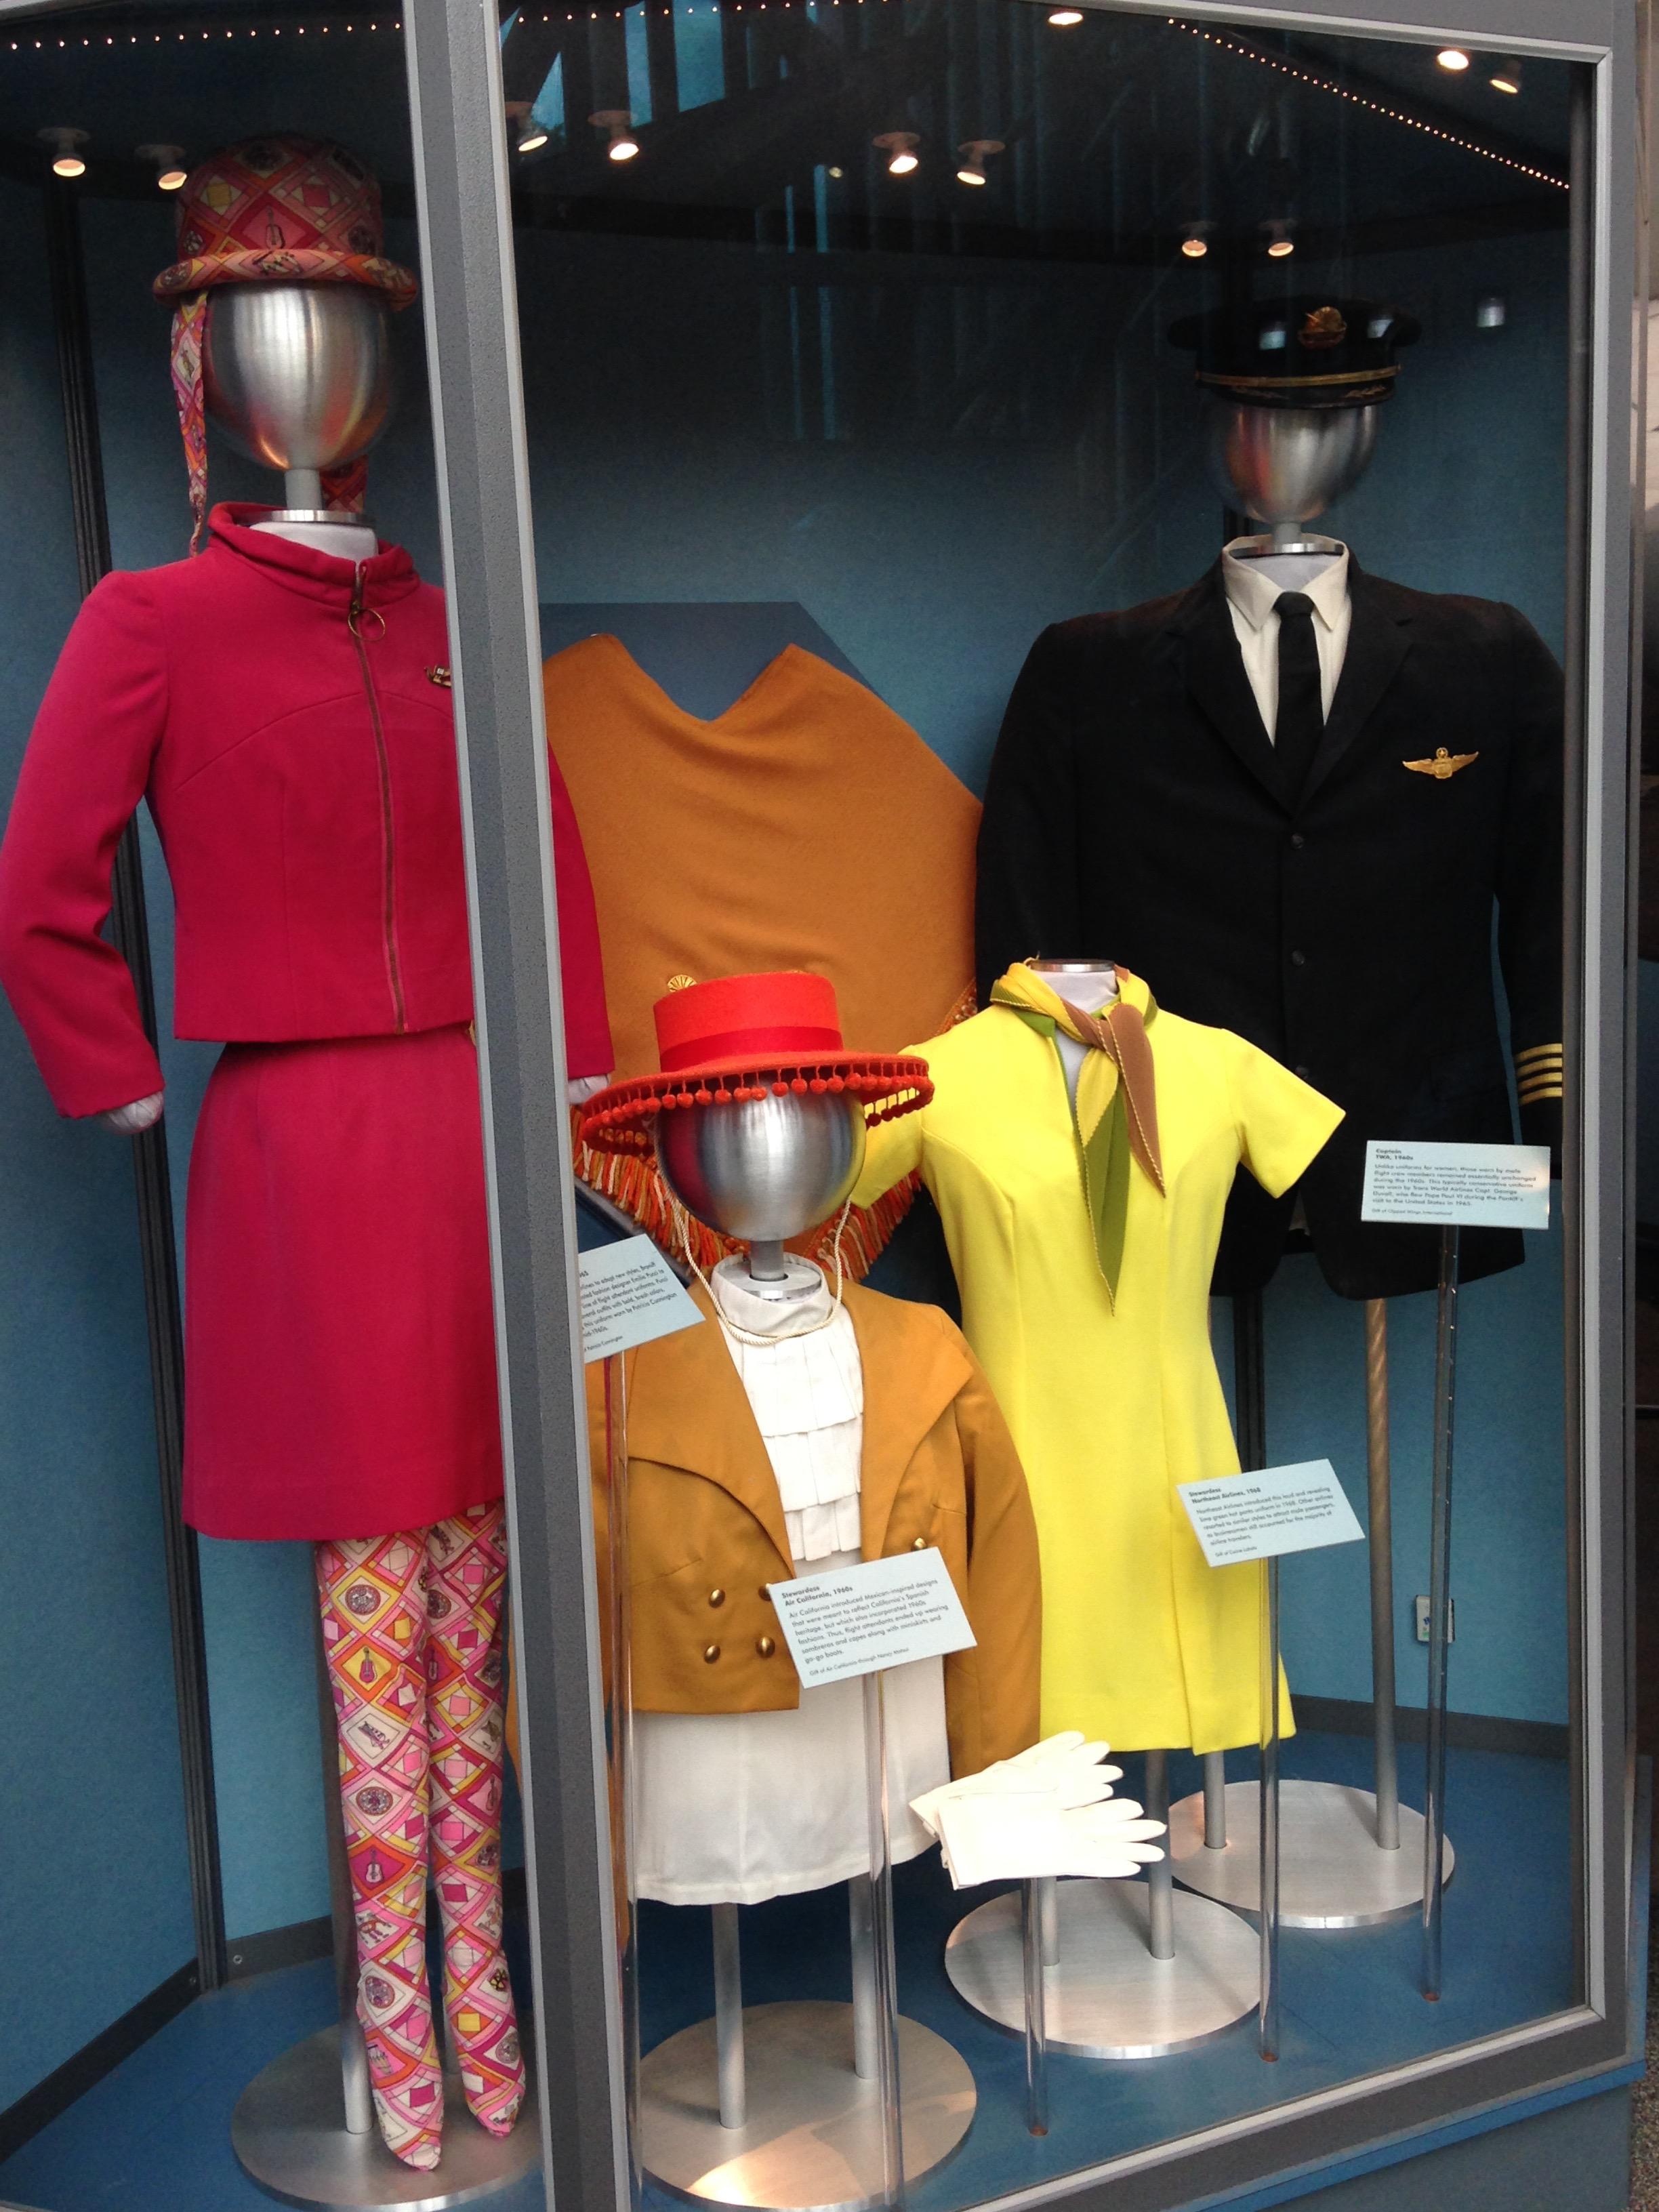 stewardess uniforms